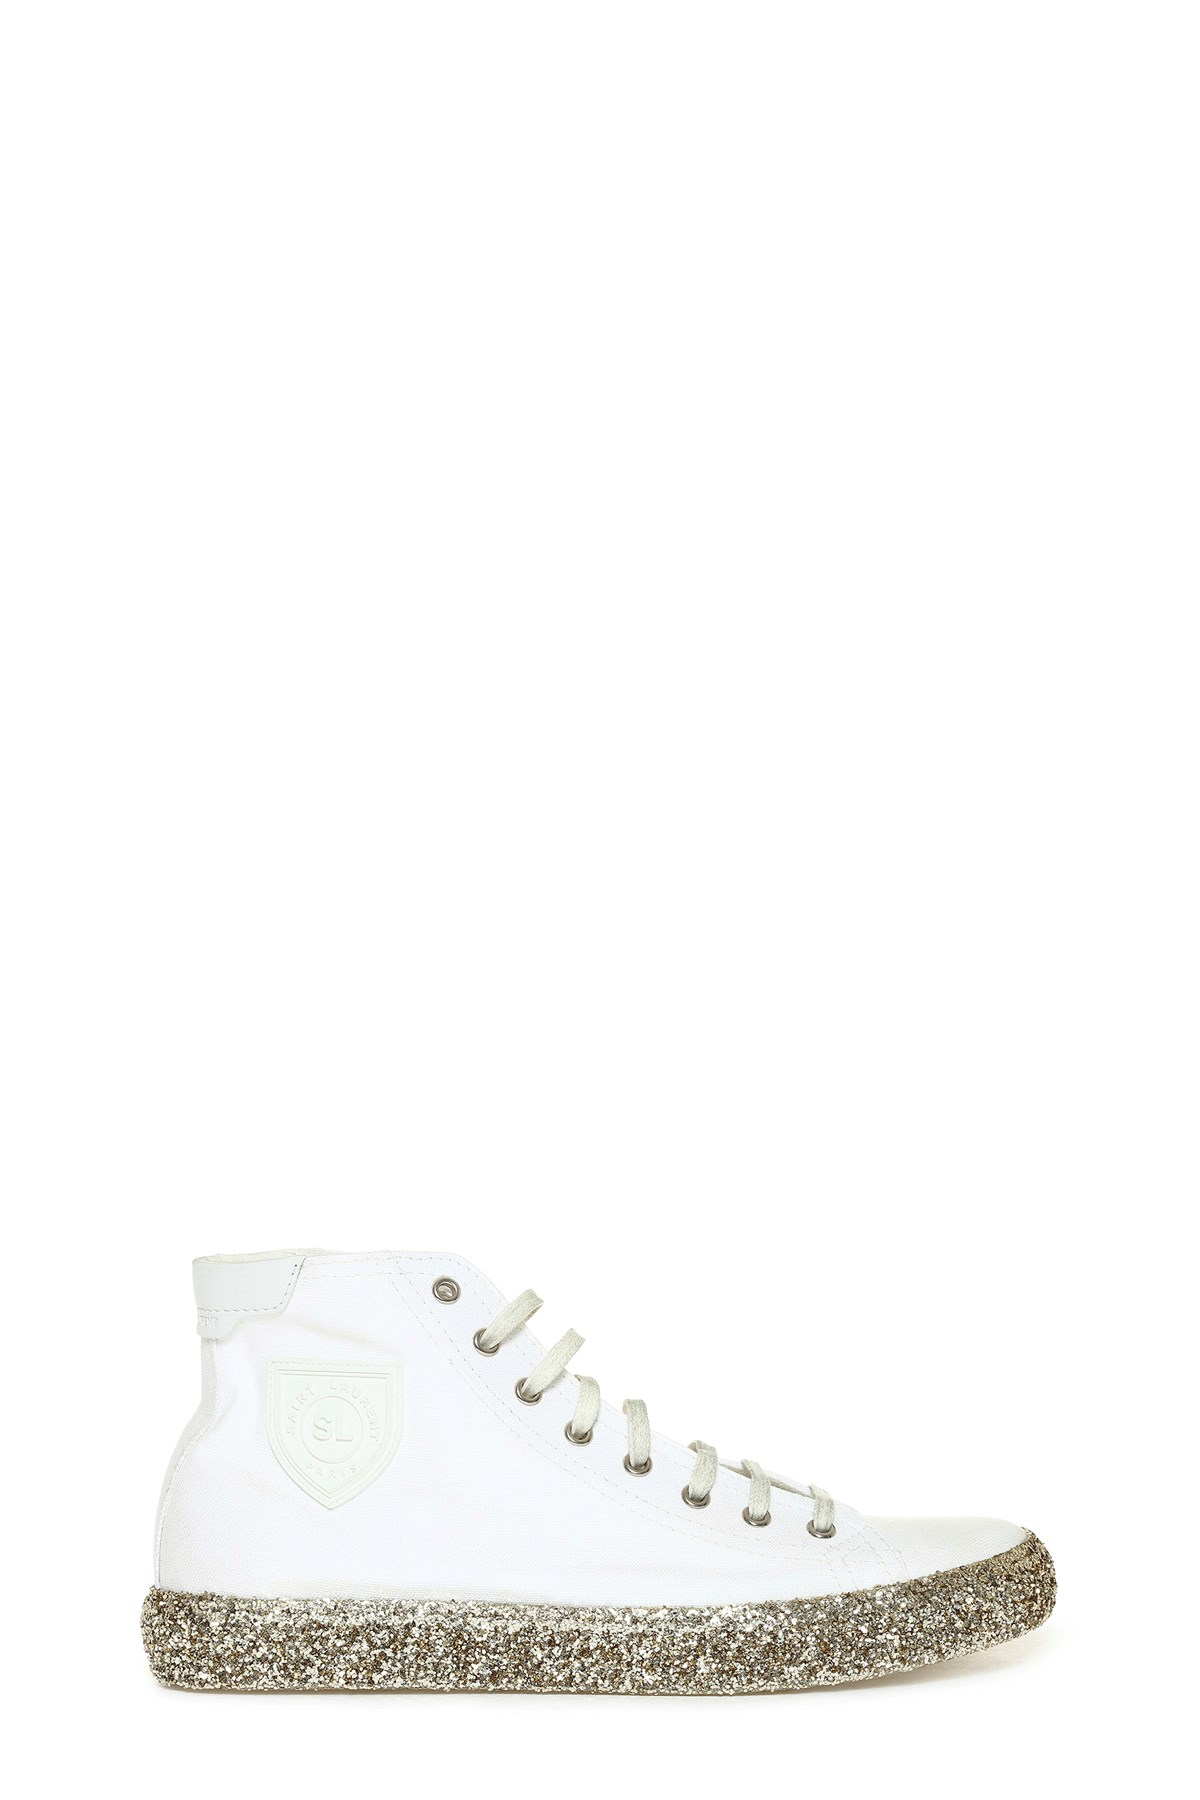 saint laurent 'Bedford' sneakers